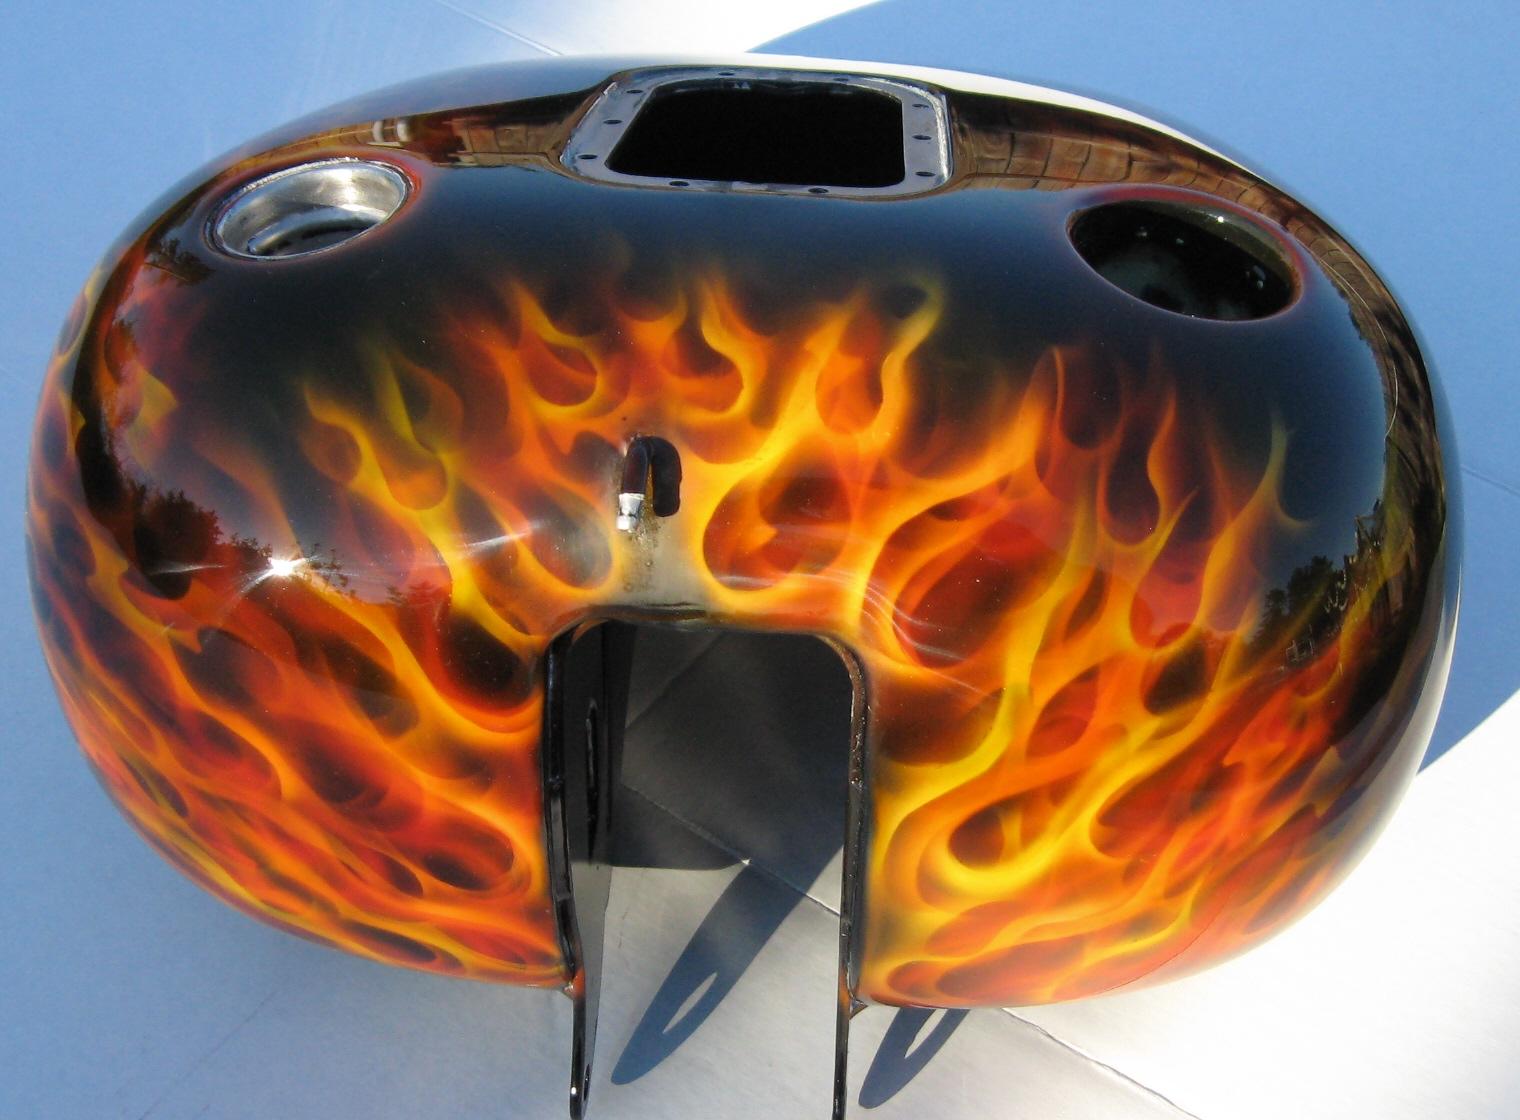 Harley-Davidson-Fantasy-True-Flame-Dragon-Skull-gastank-2